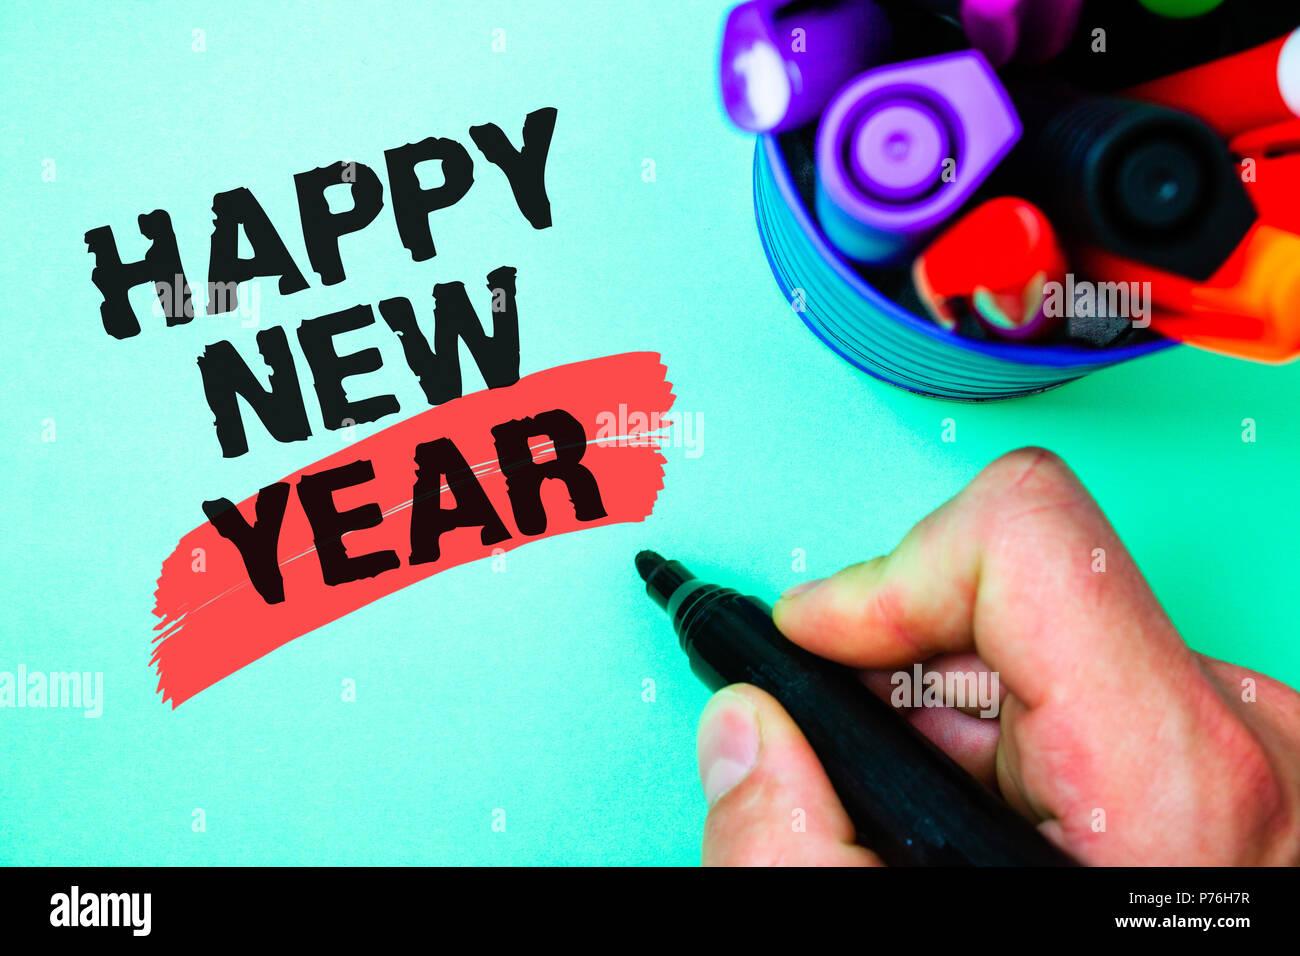 Merry Sparkler Word Stockfotos & Merry Sparkler Word Bilder - Alamy